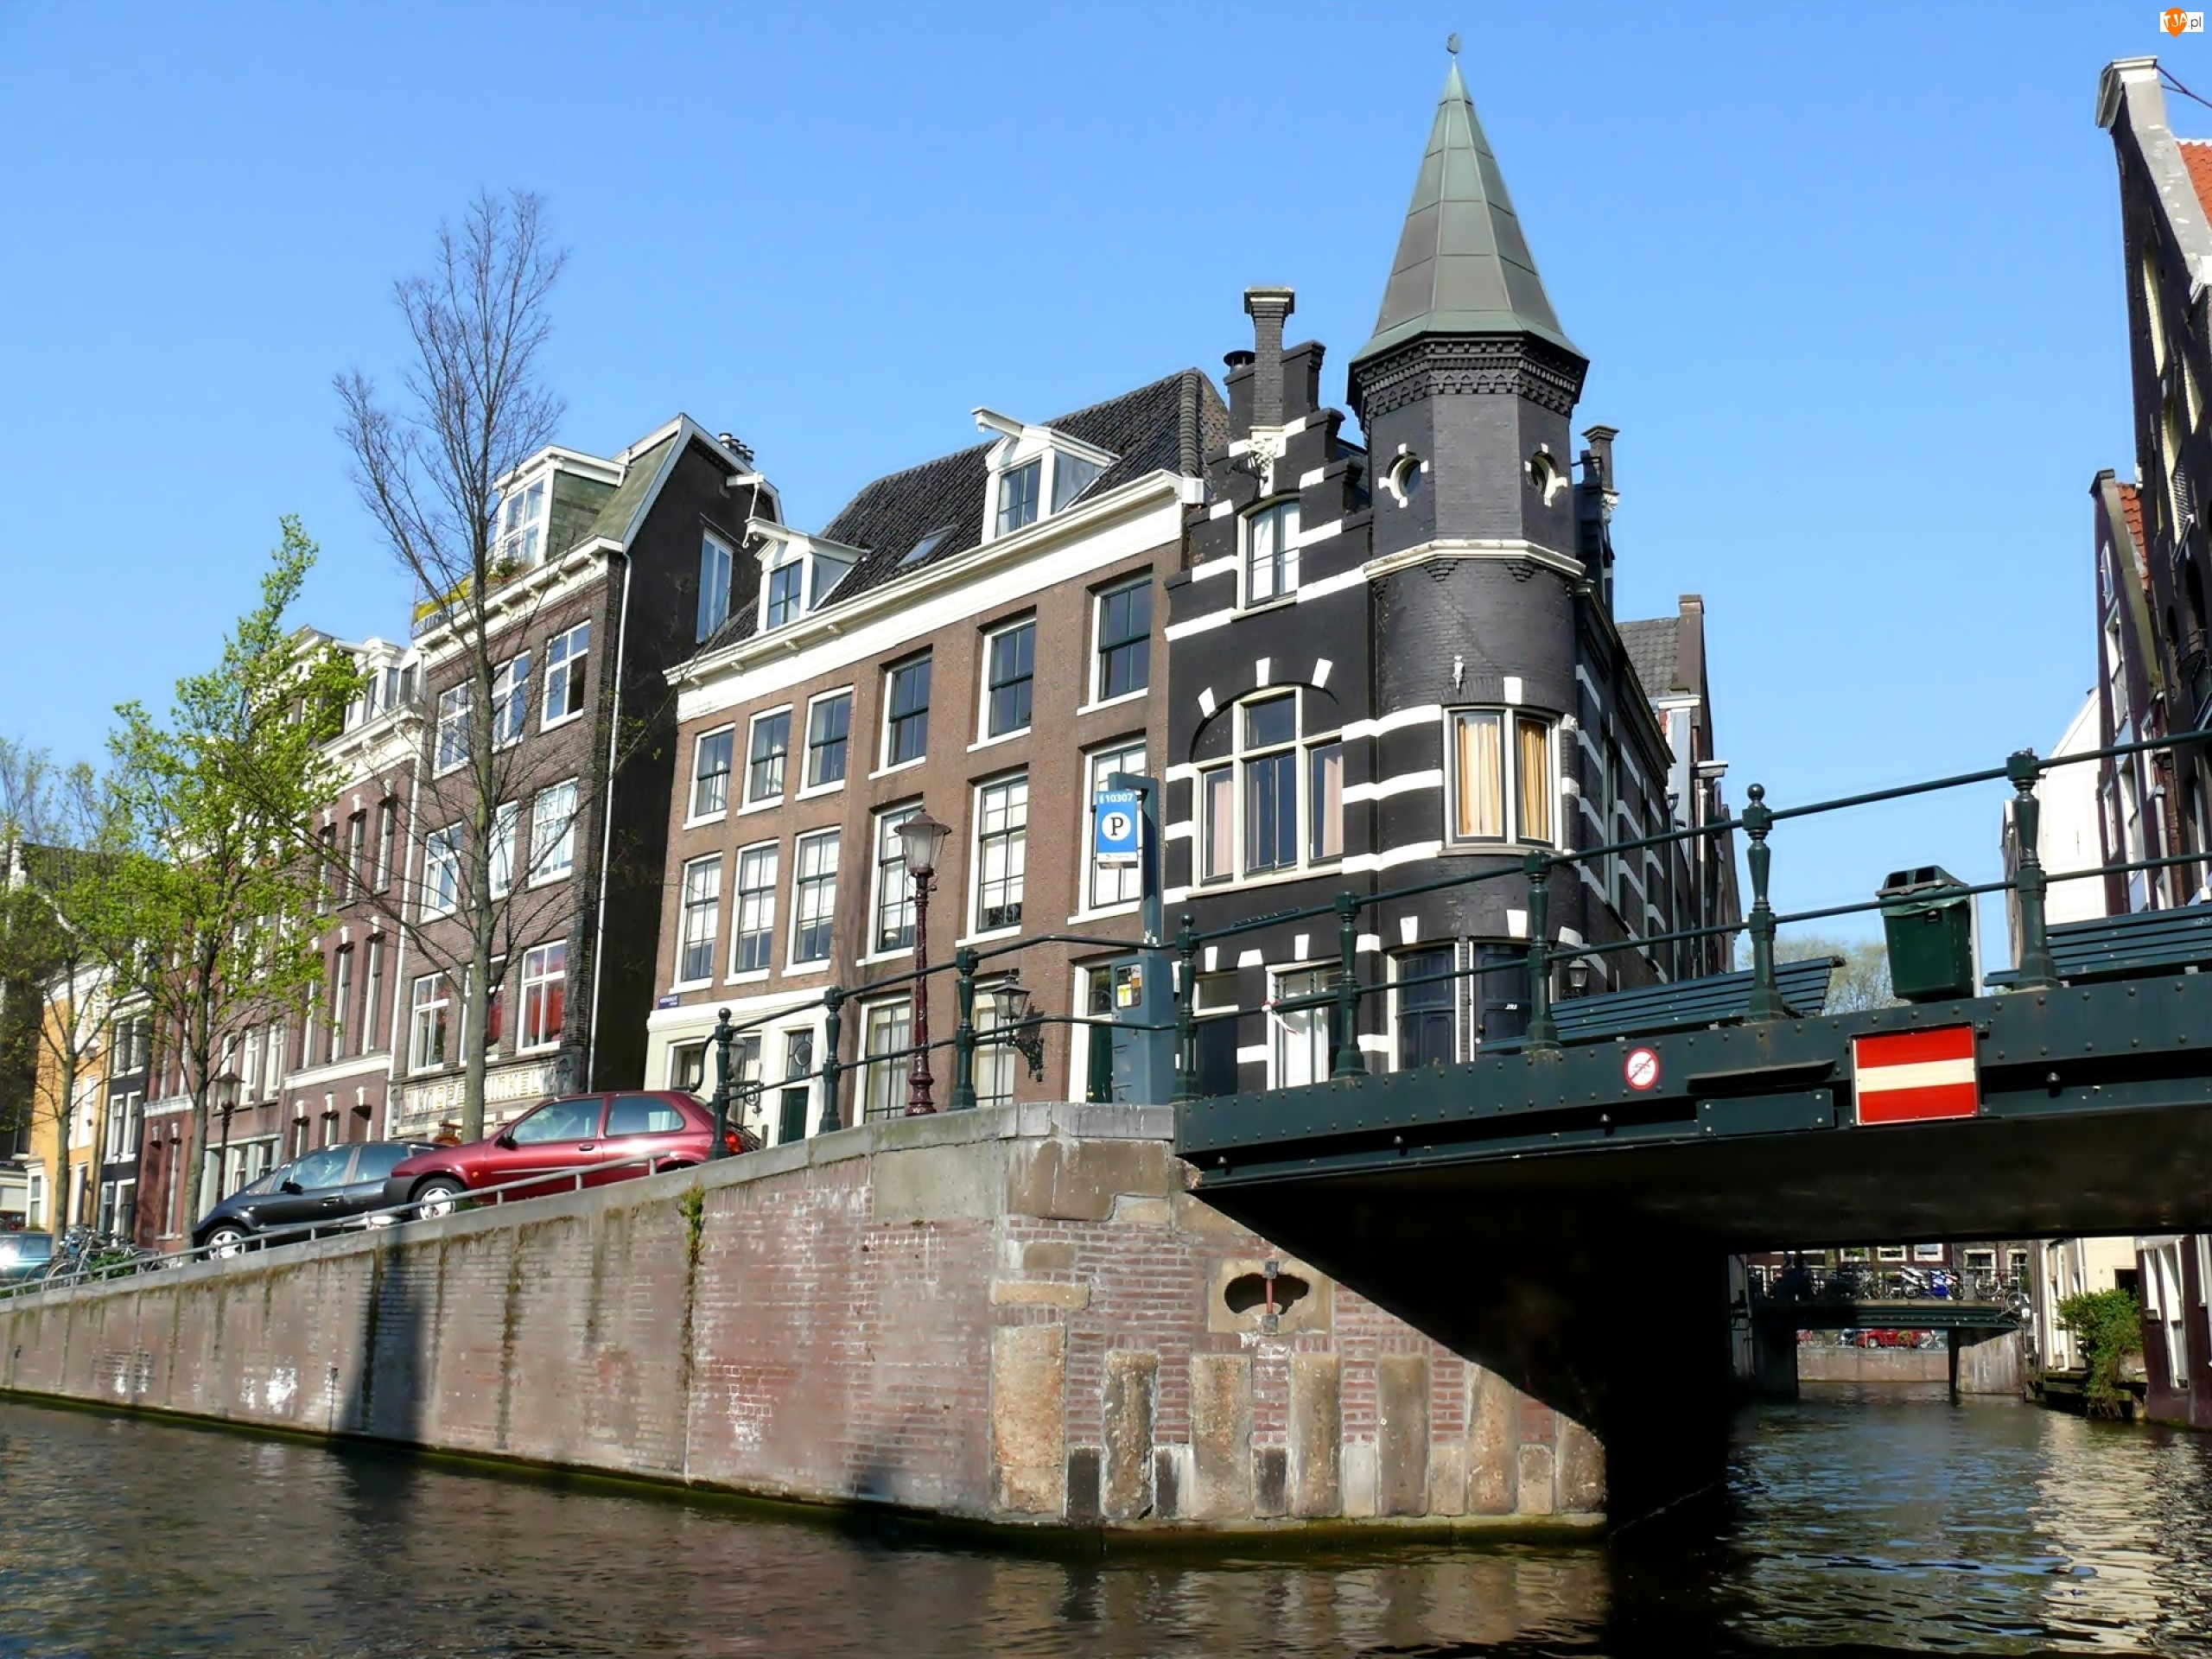 Miasto, Holandia, Kanał, Kamienica, Most